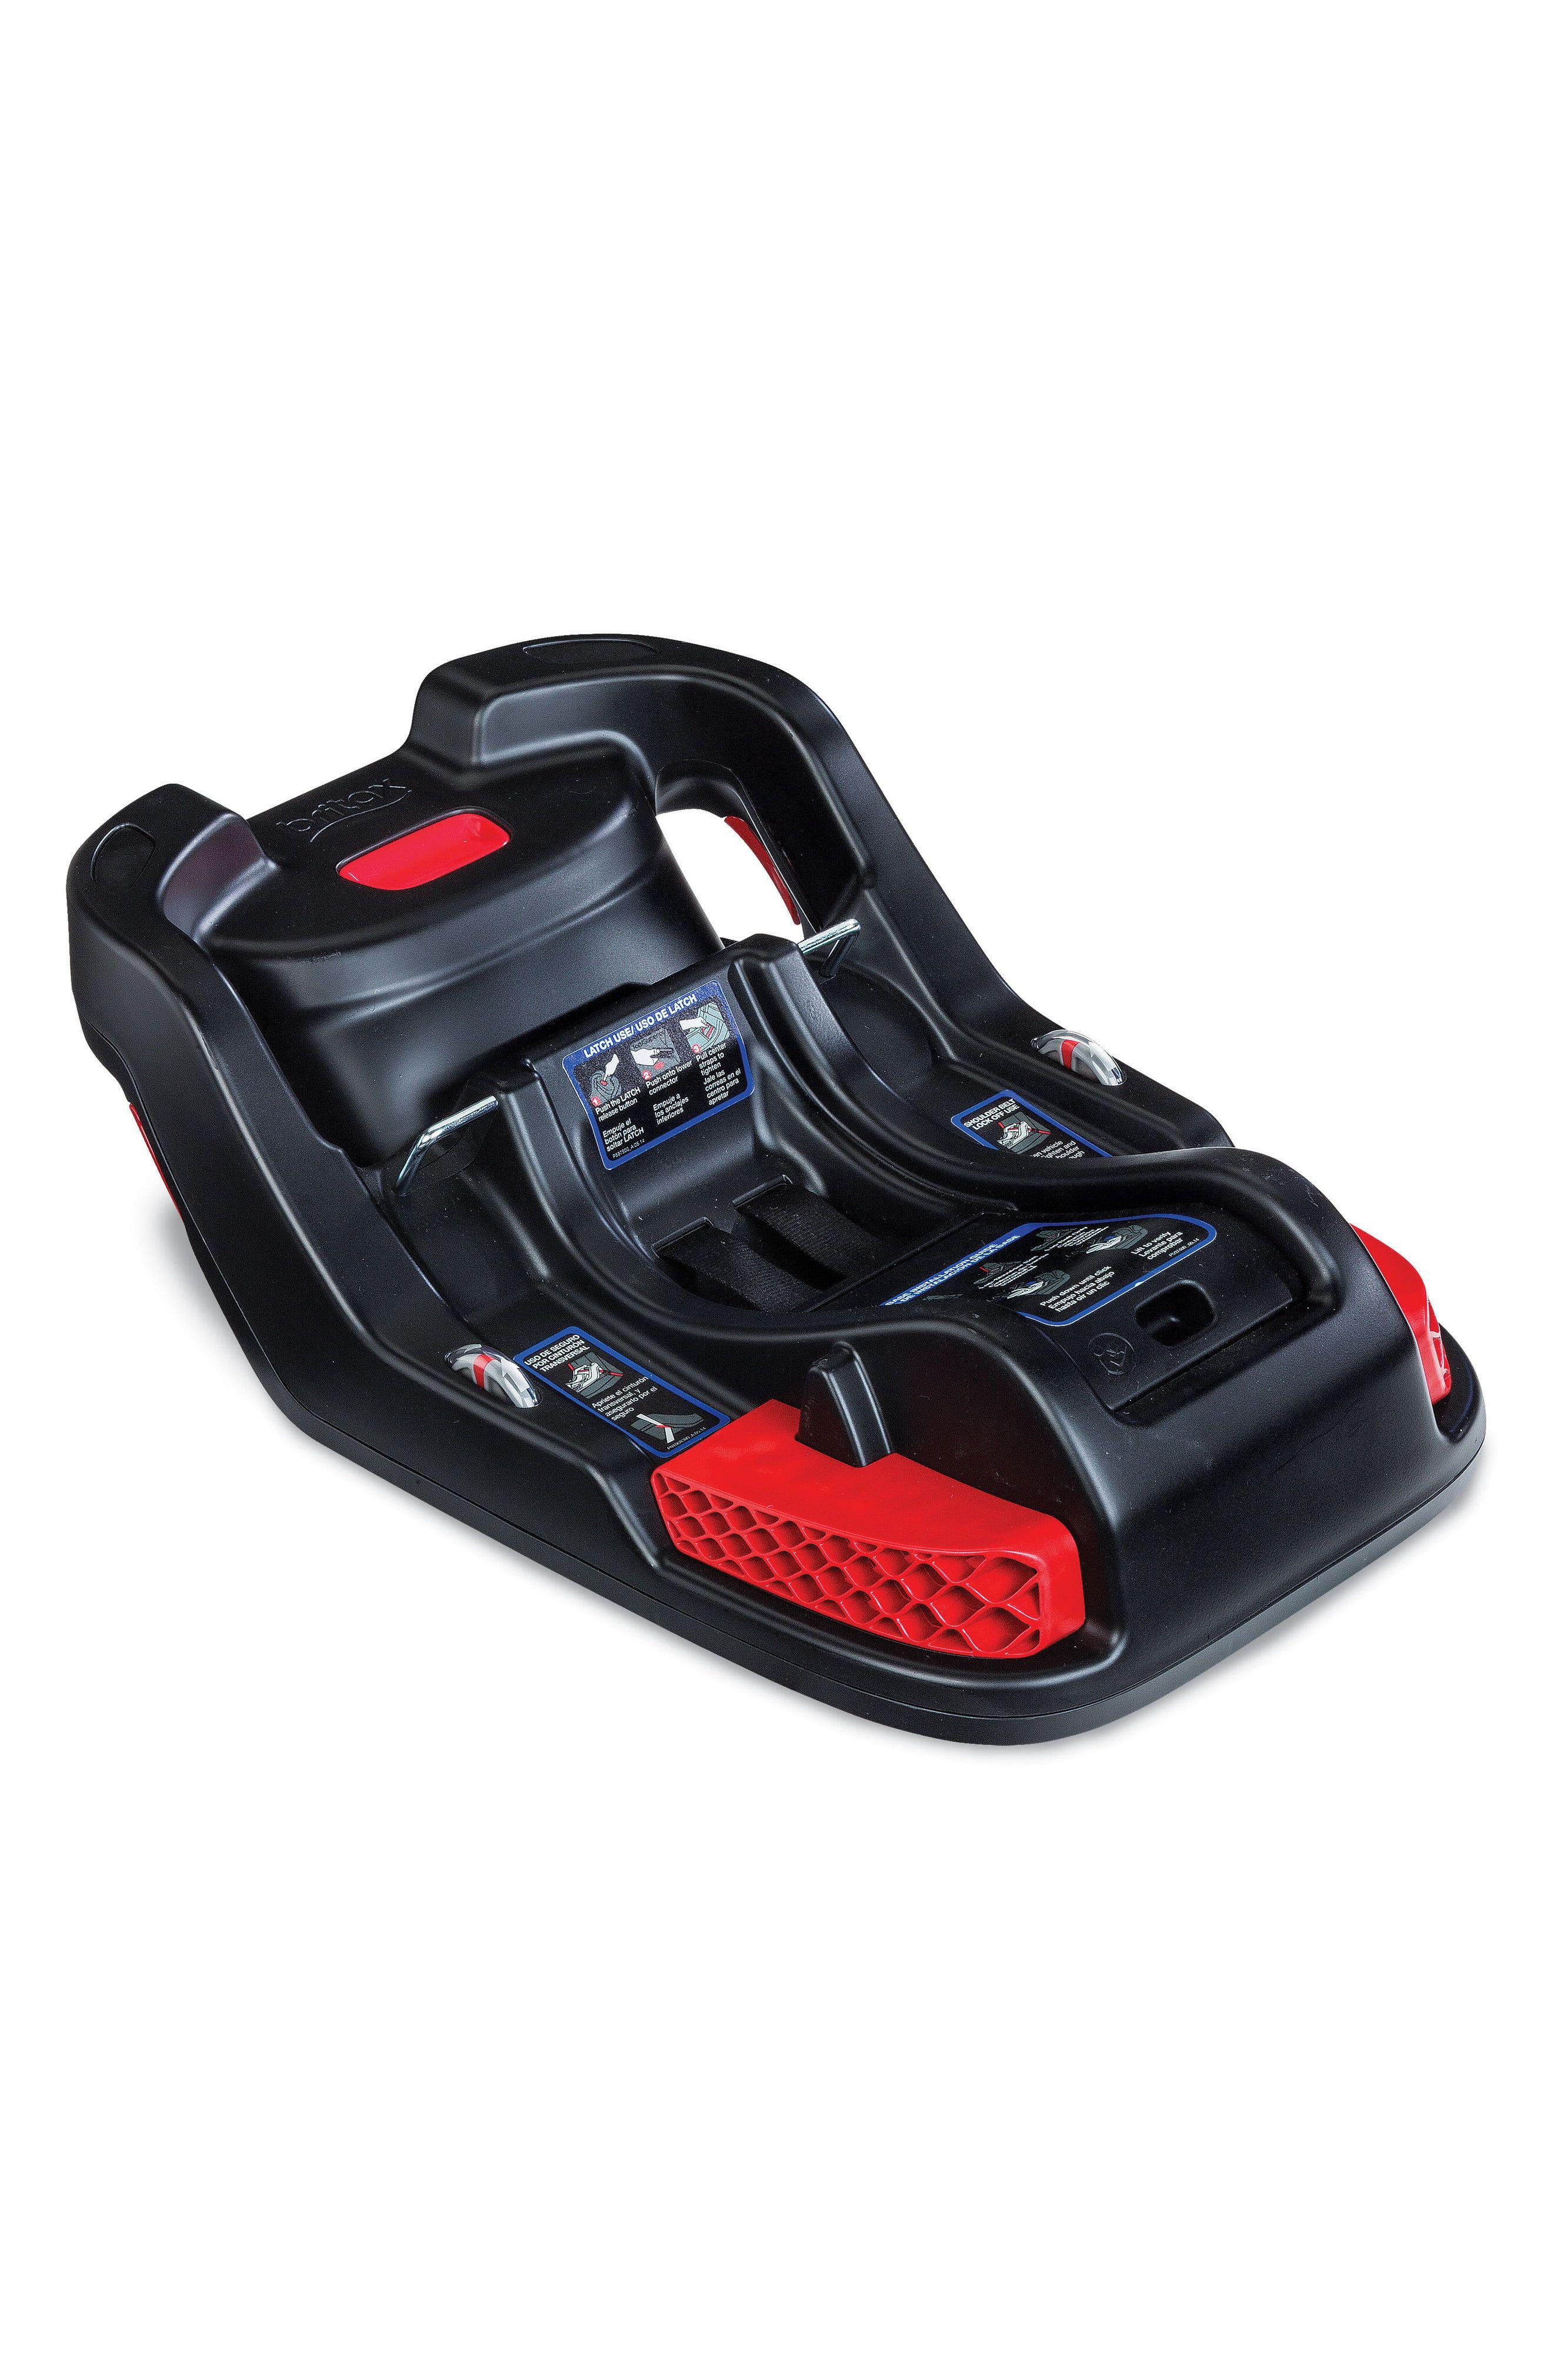 Bob B Safe 35 By Britax Infant Car Seat Base Baby Car Seats Car Seats Britax Infant Car Seat